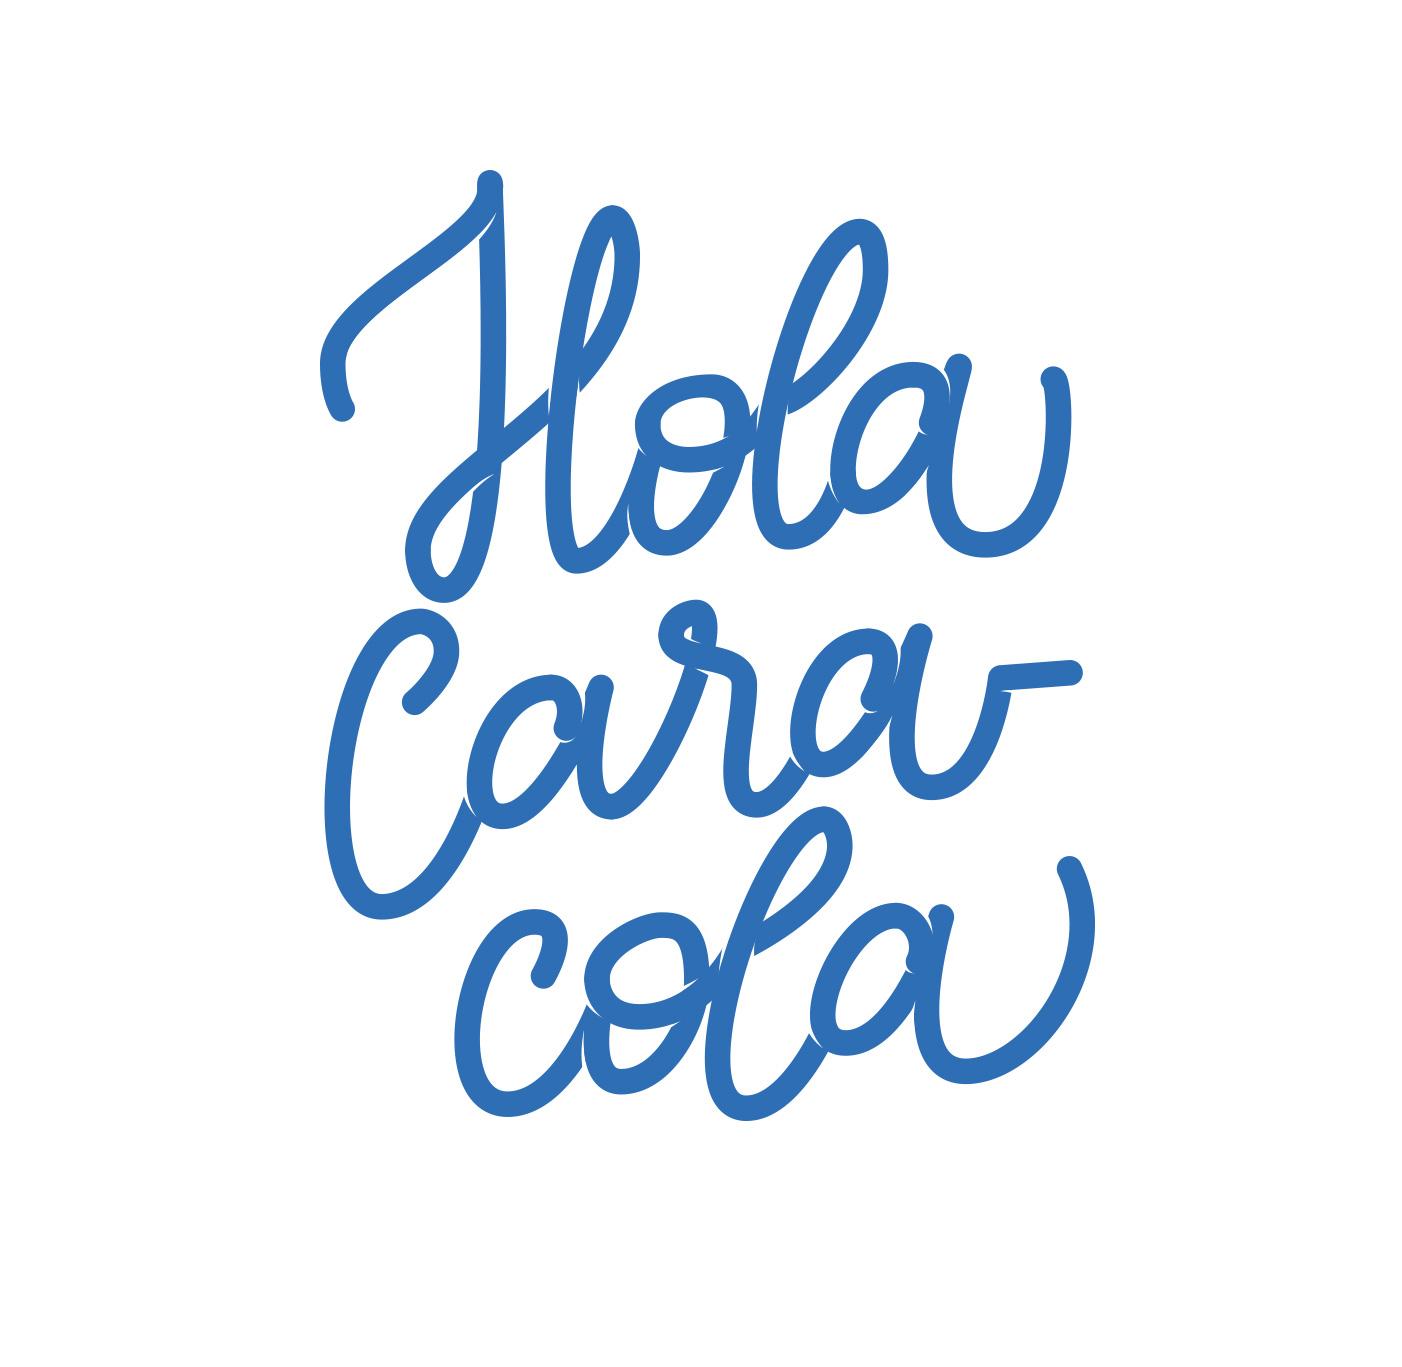 holacaracola